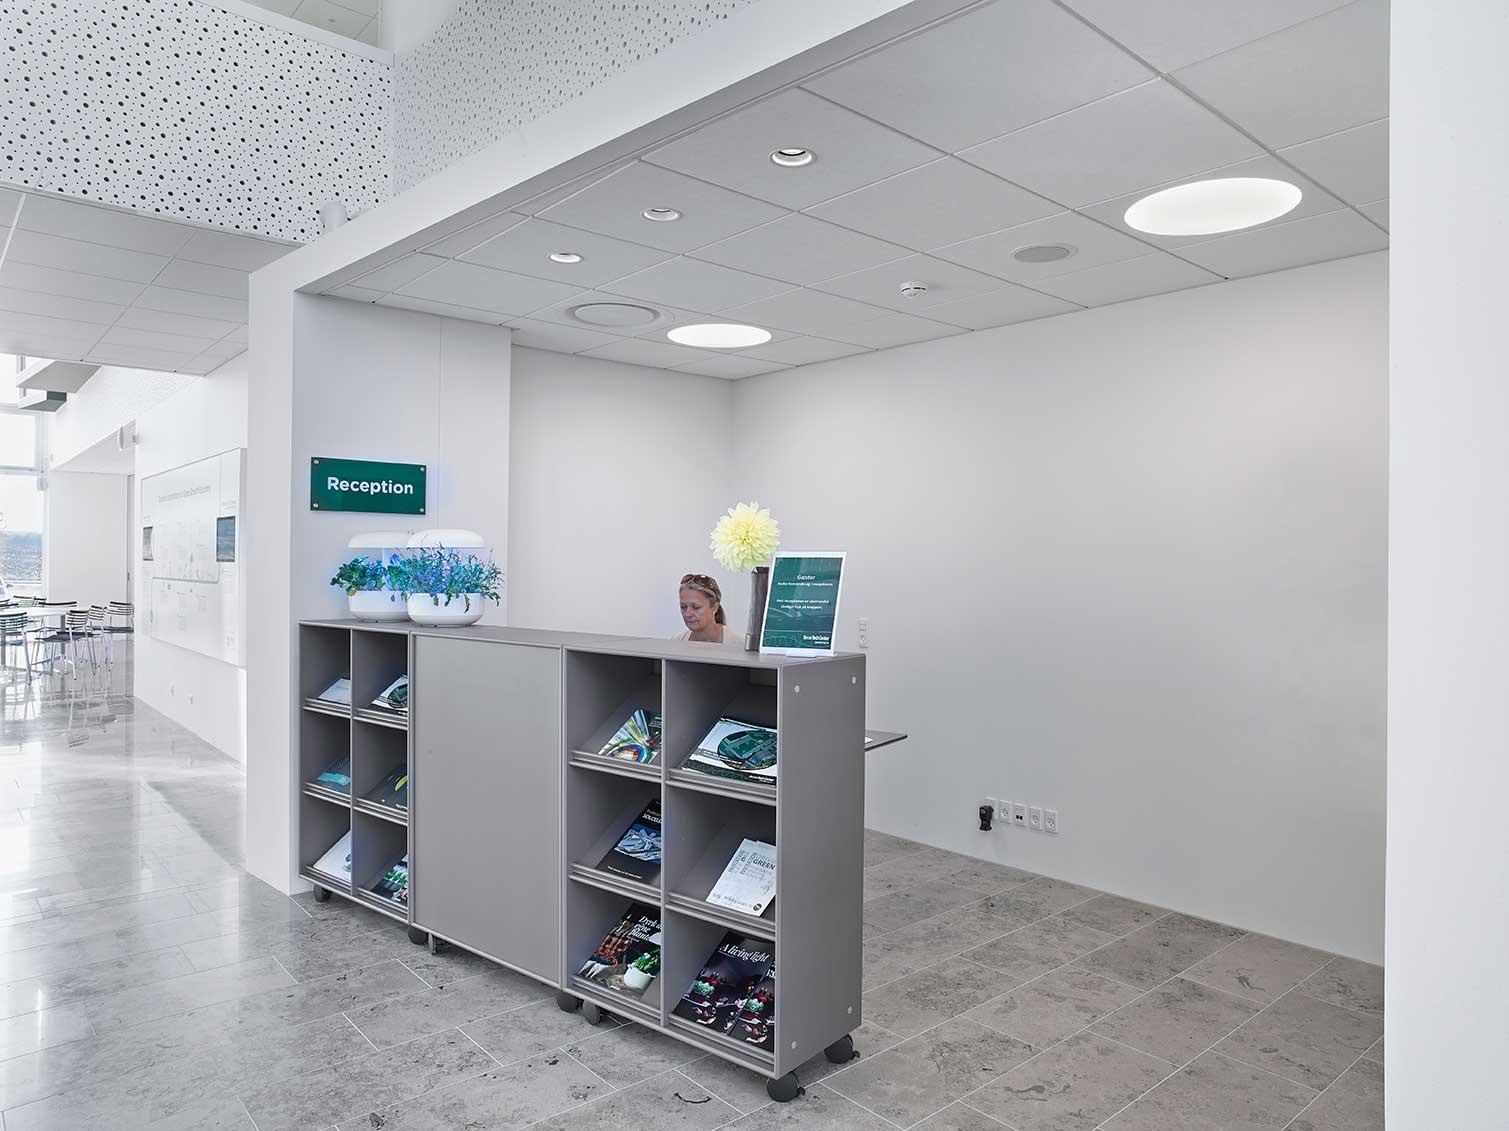 Ledgo Circle 595 LED panel lampe og EDLR downlight lampe indbygget i loftet ved receptionen - Luminex